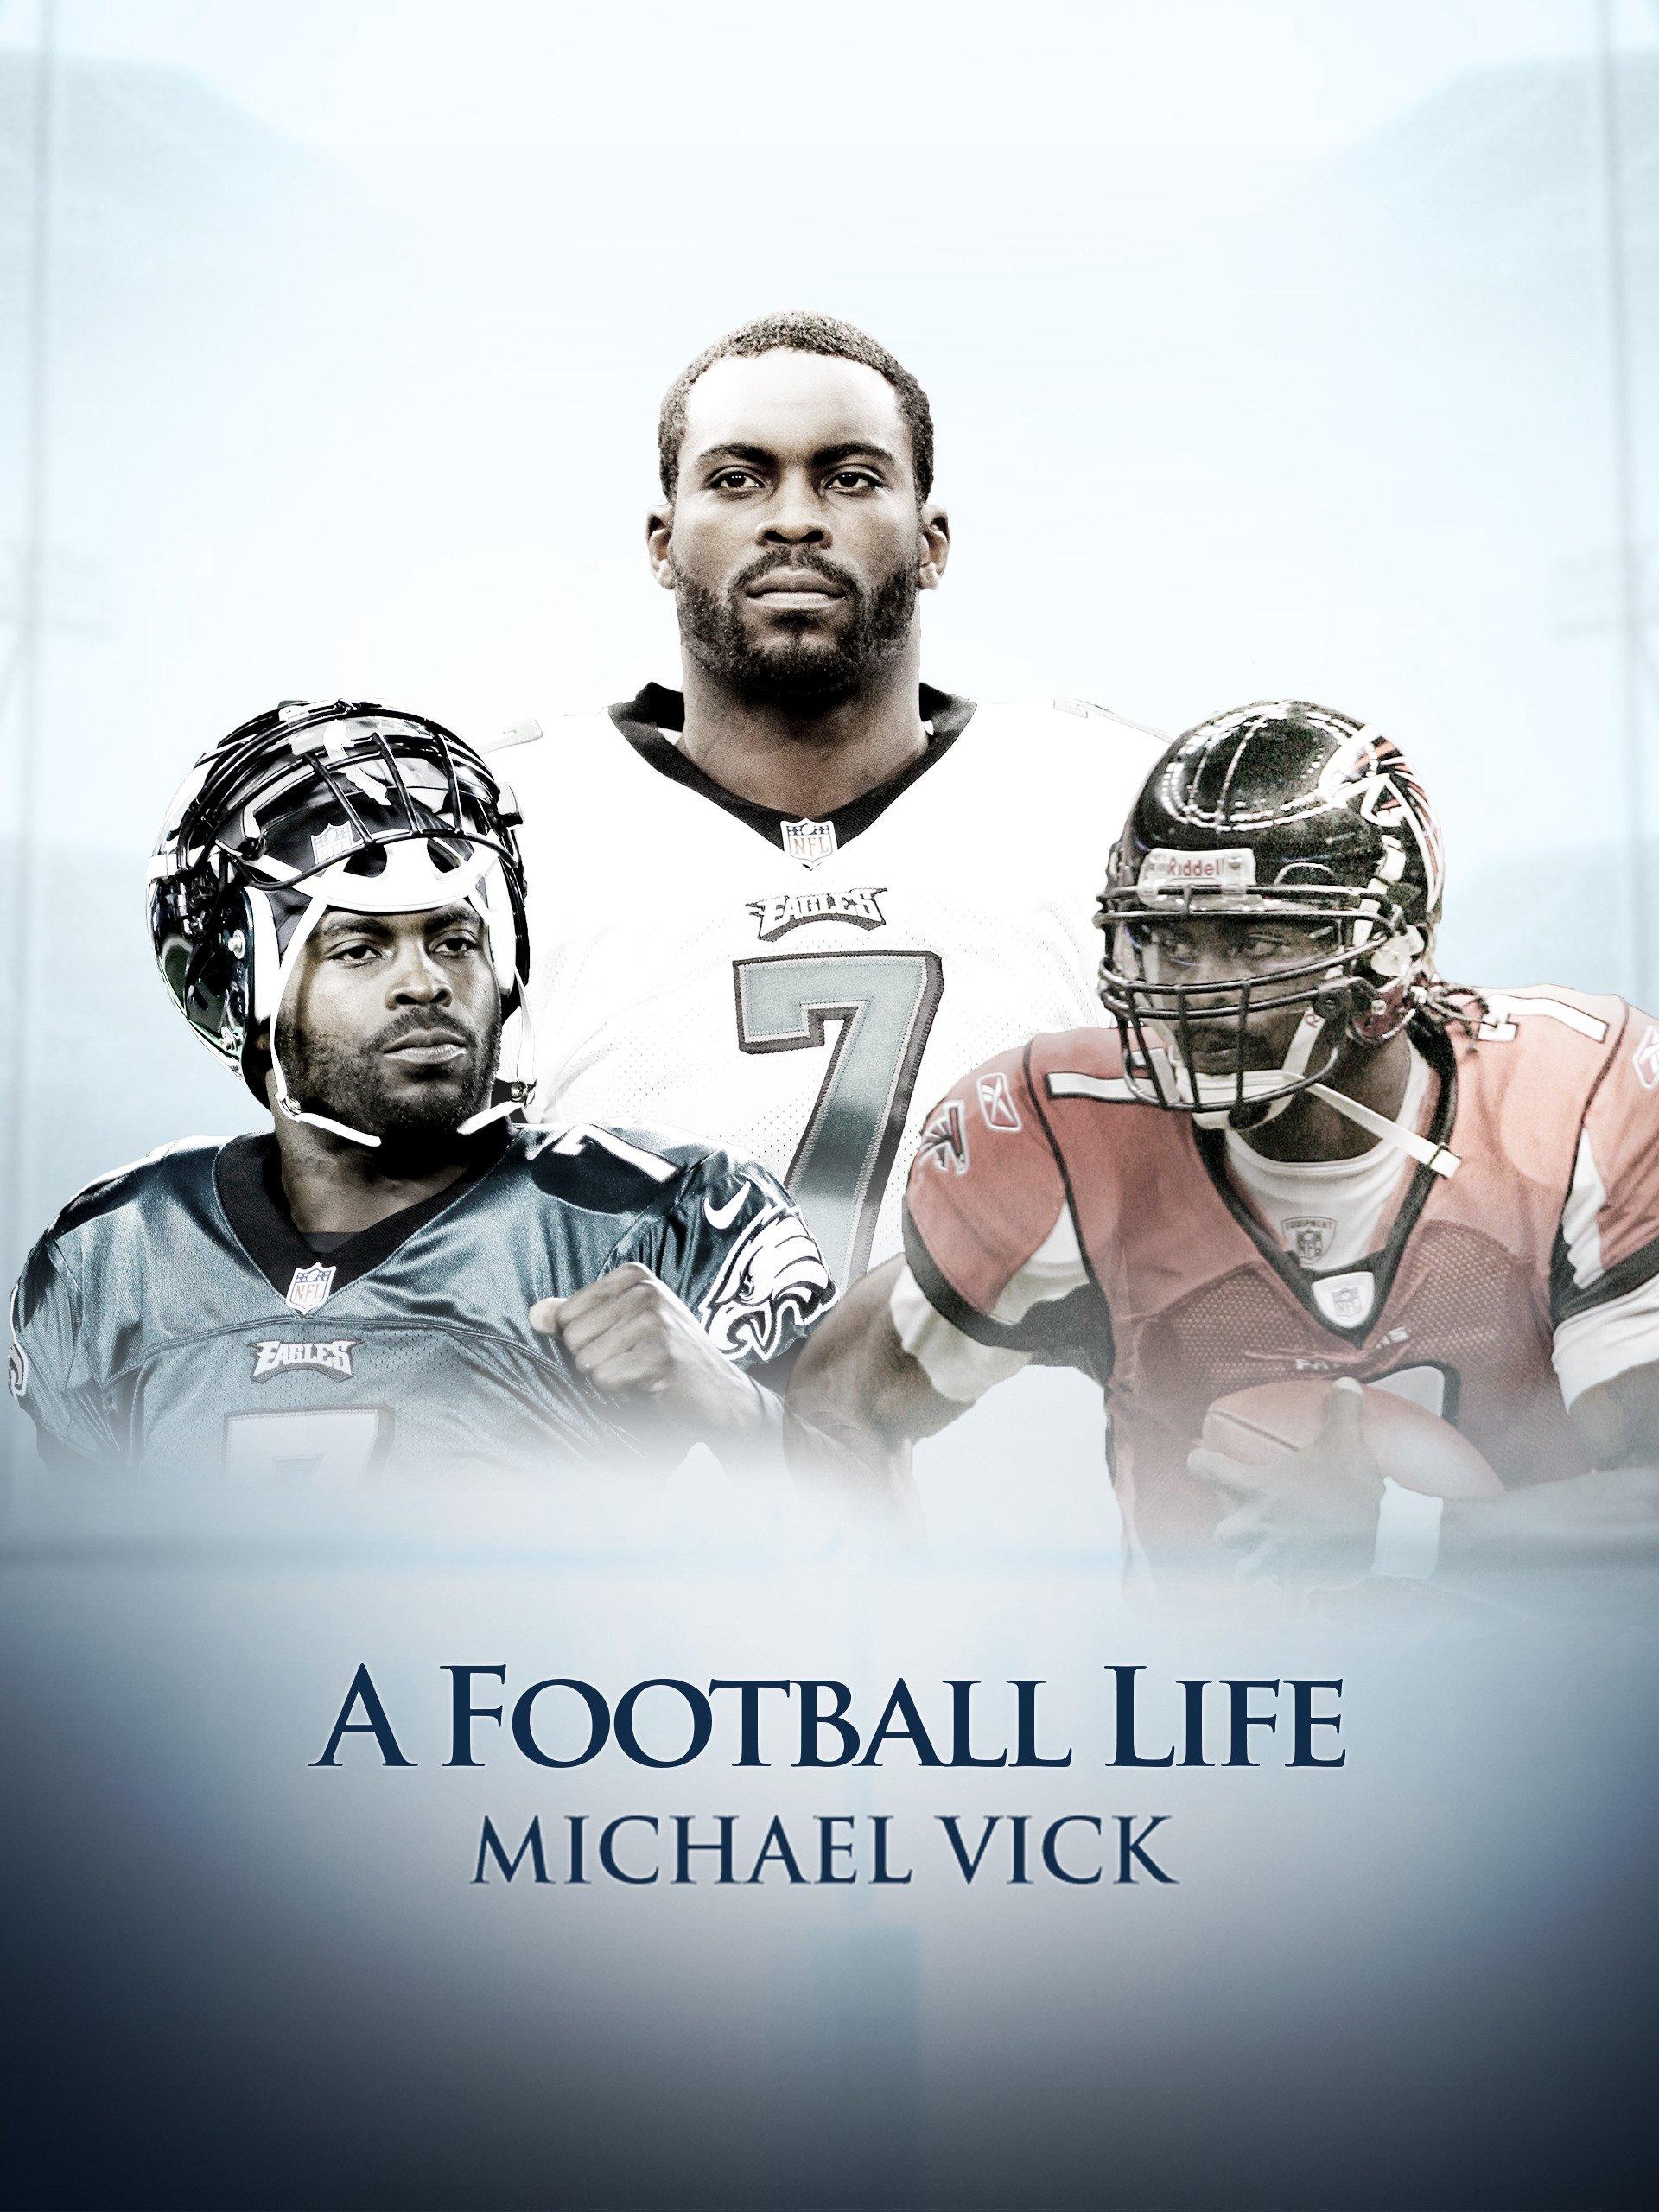 A Football Life - Mike Vick on Amazon Prime Video UK